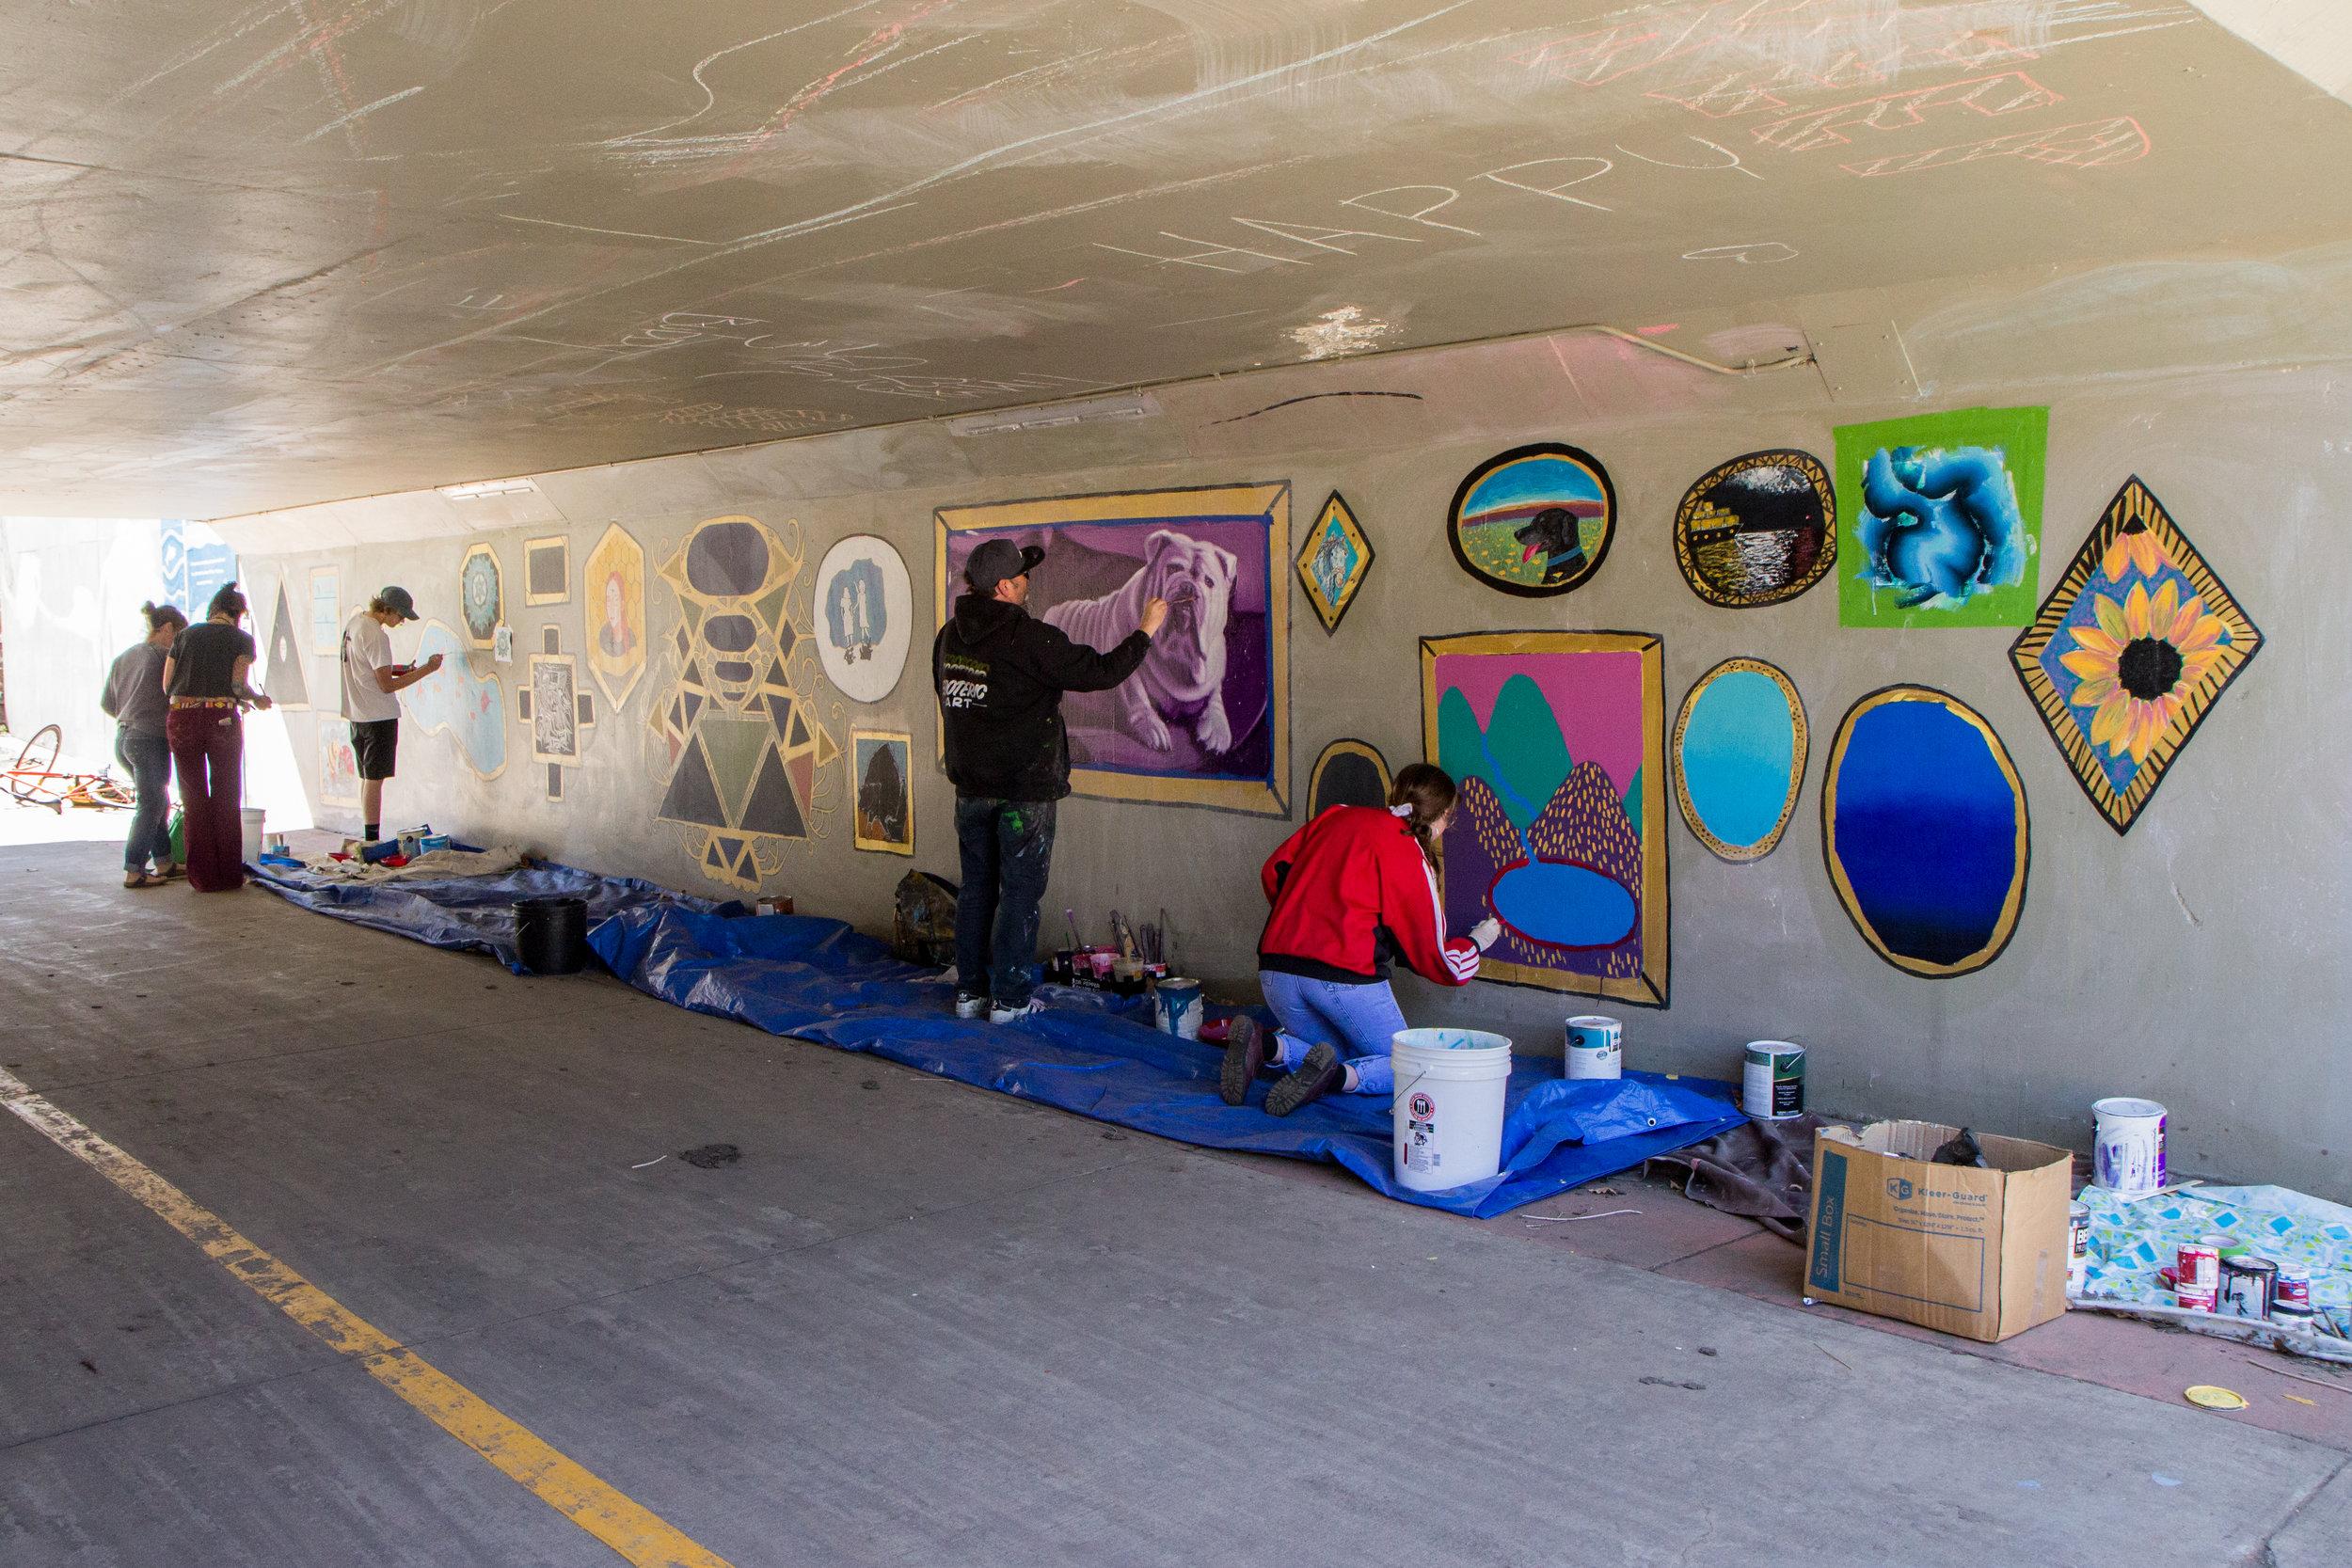 Arts Martin Acres murals 4.11.18-27.jpg